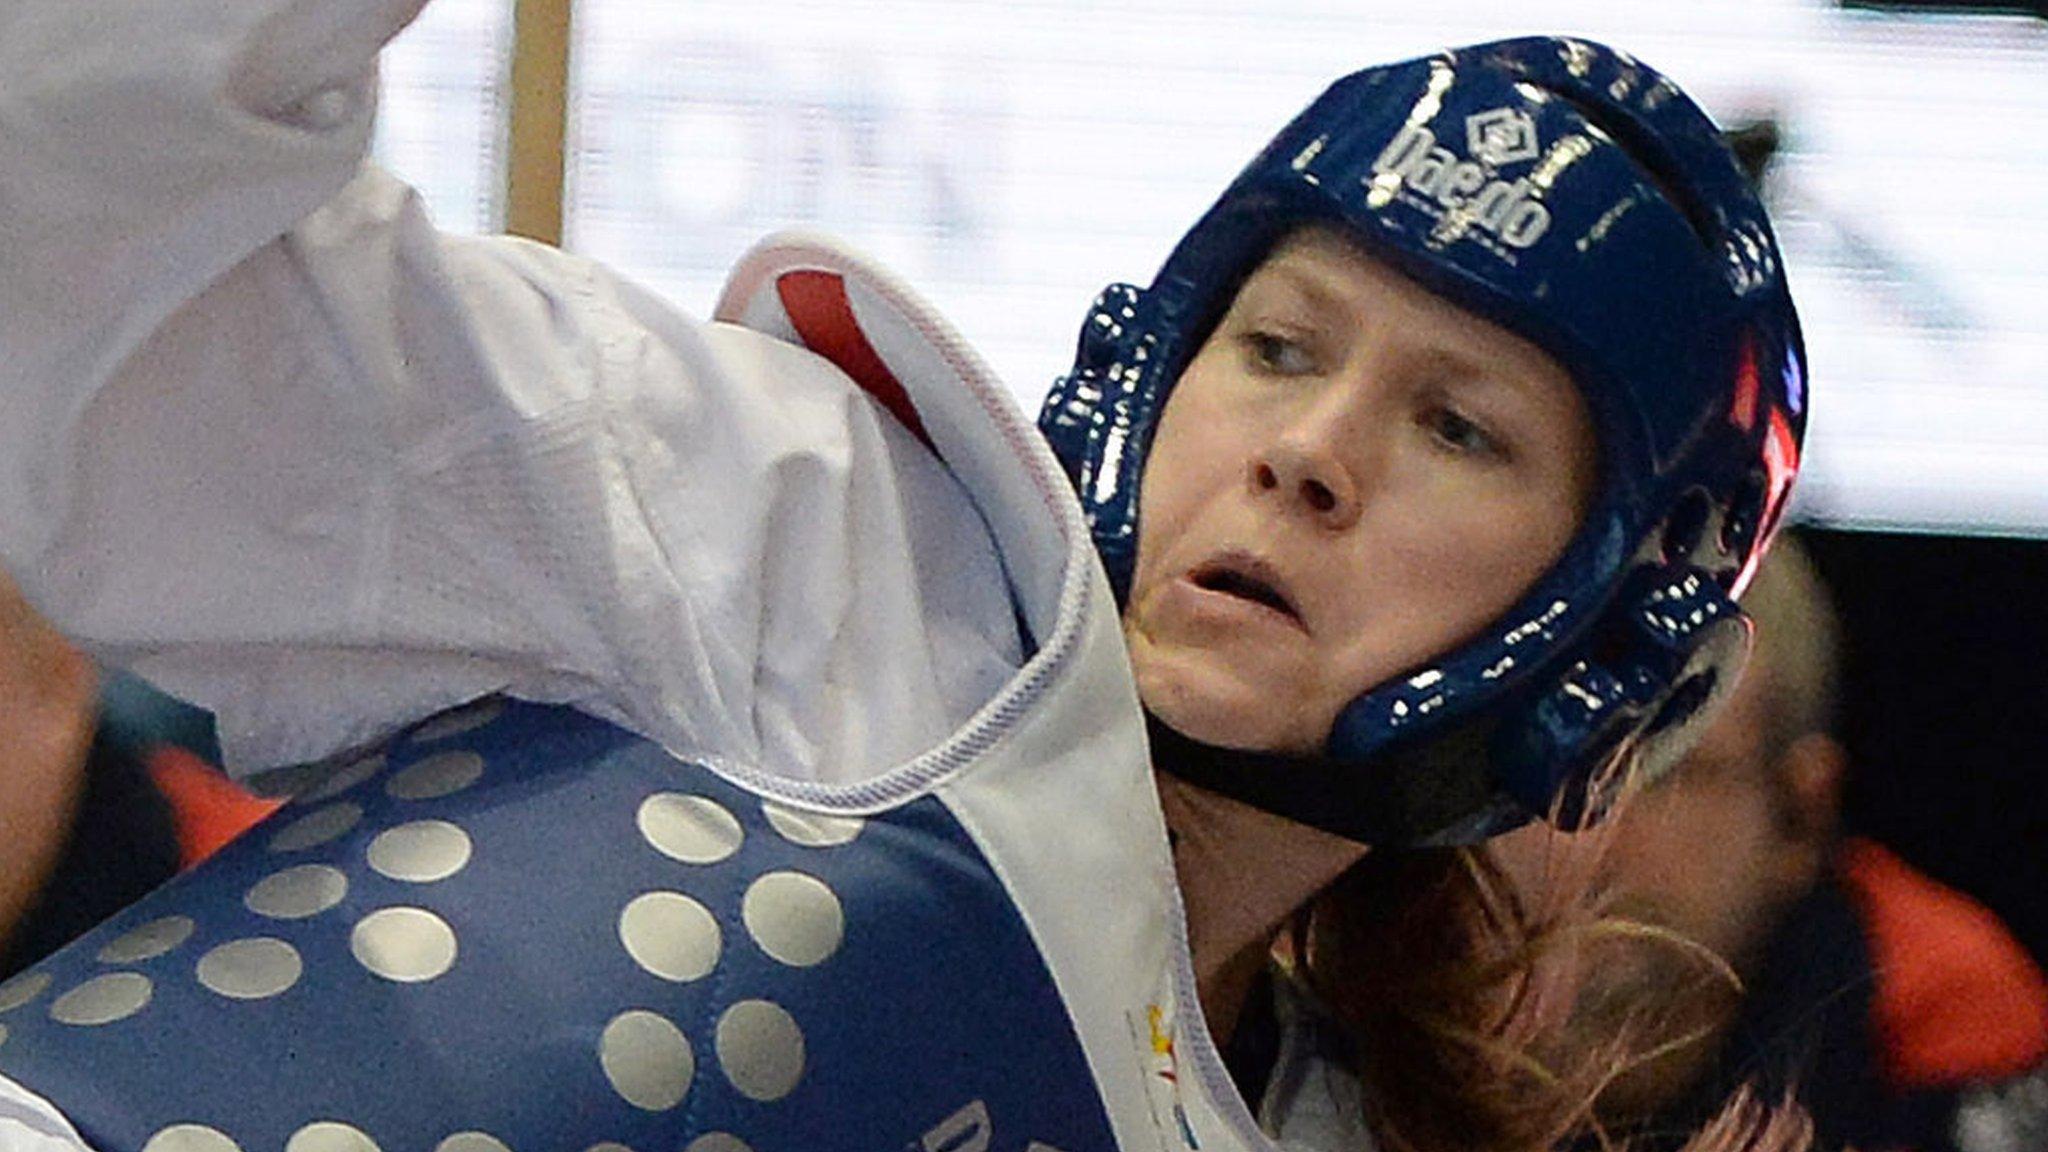 Caroline Facer: British taekwondo fighter dies aged 34